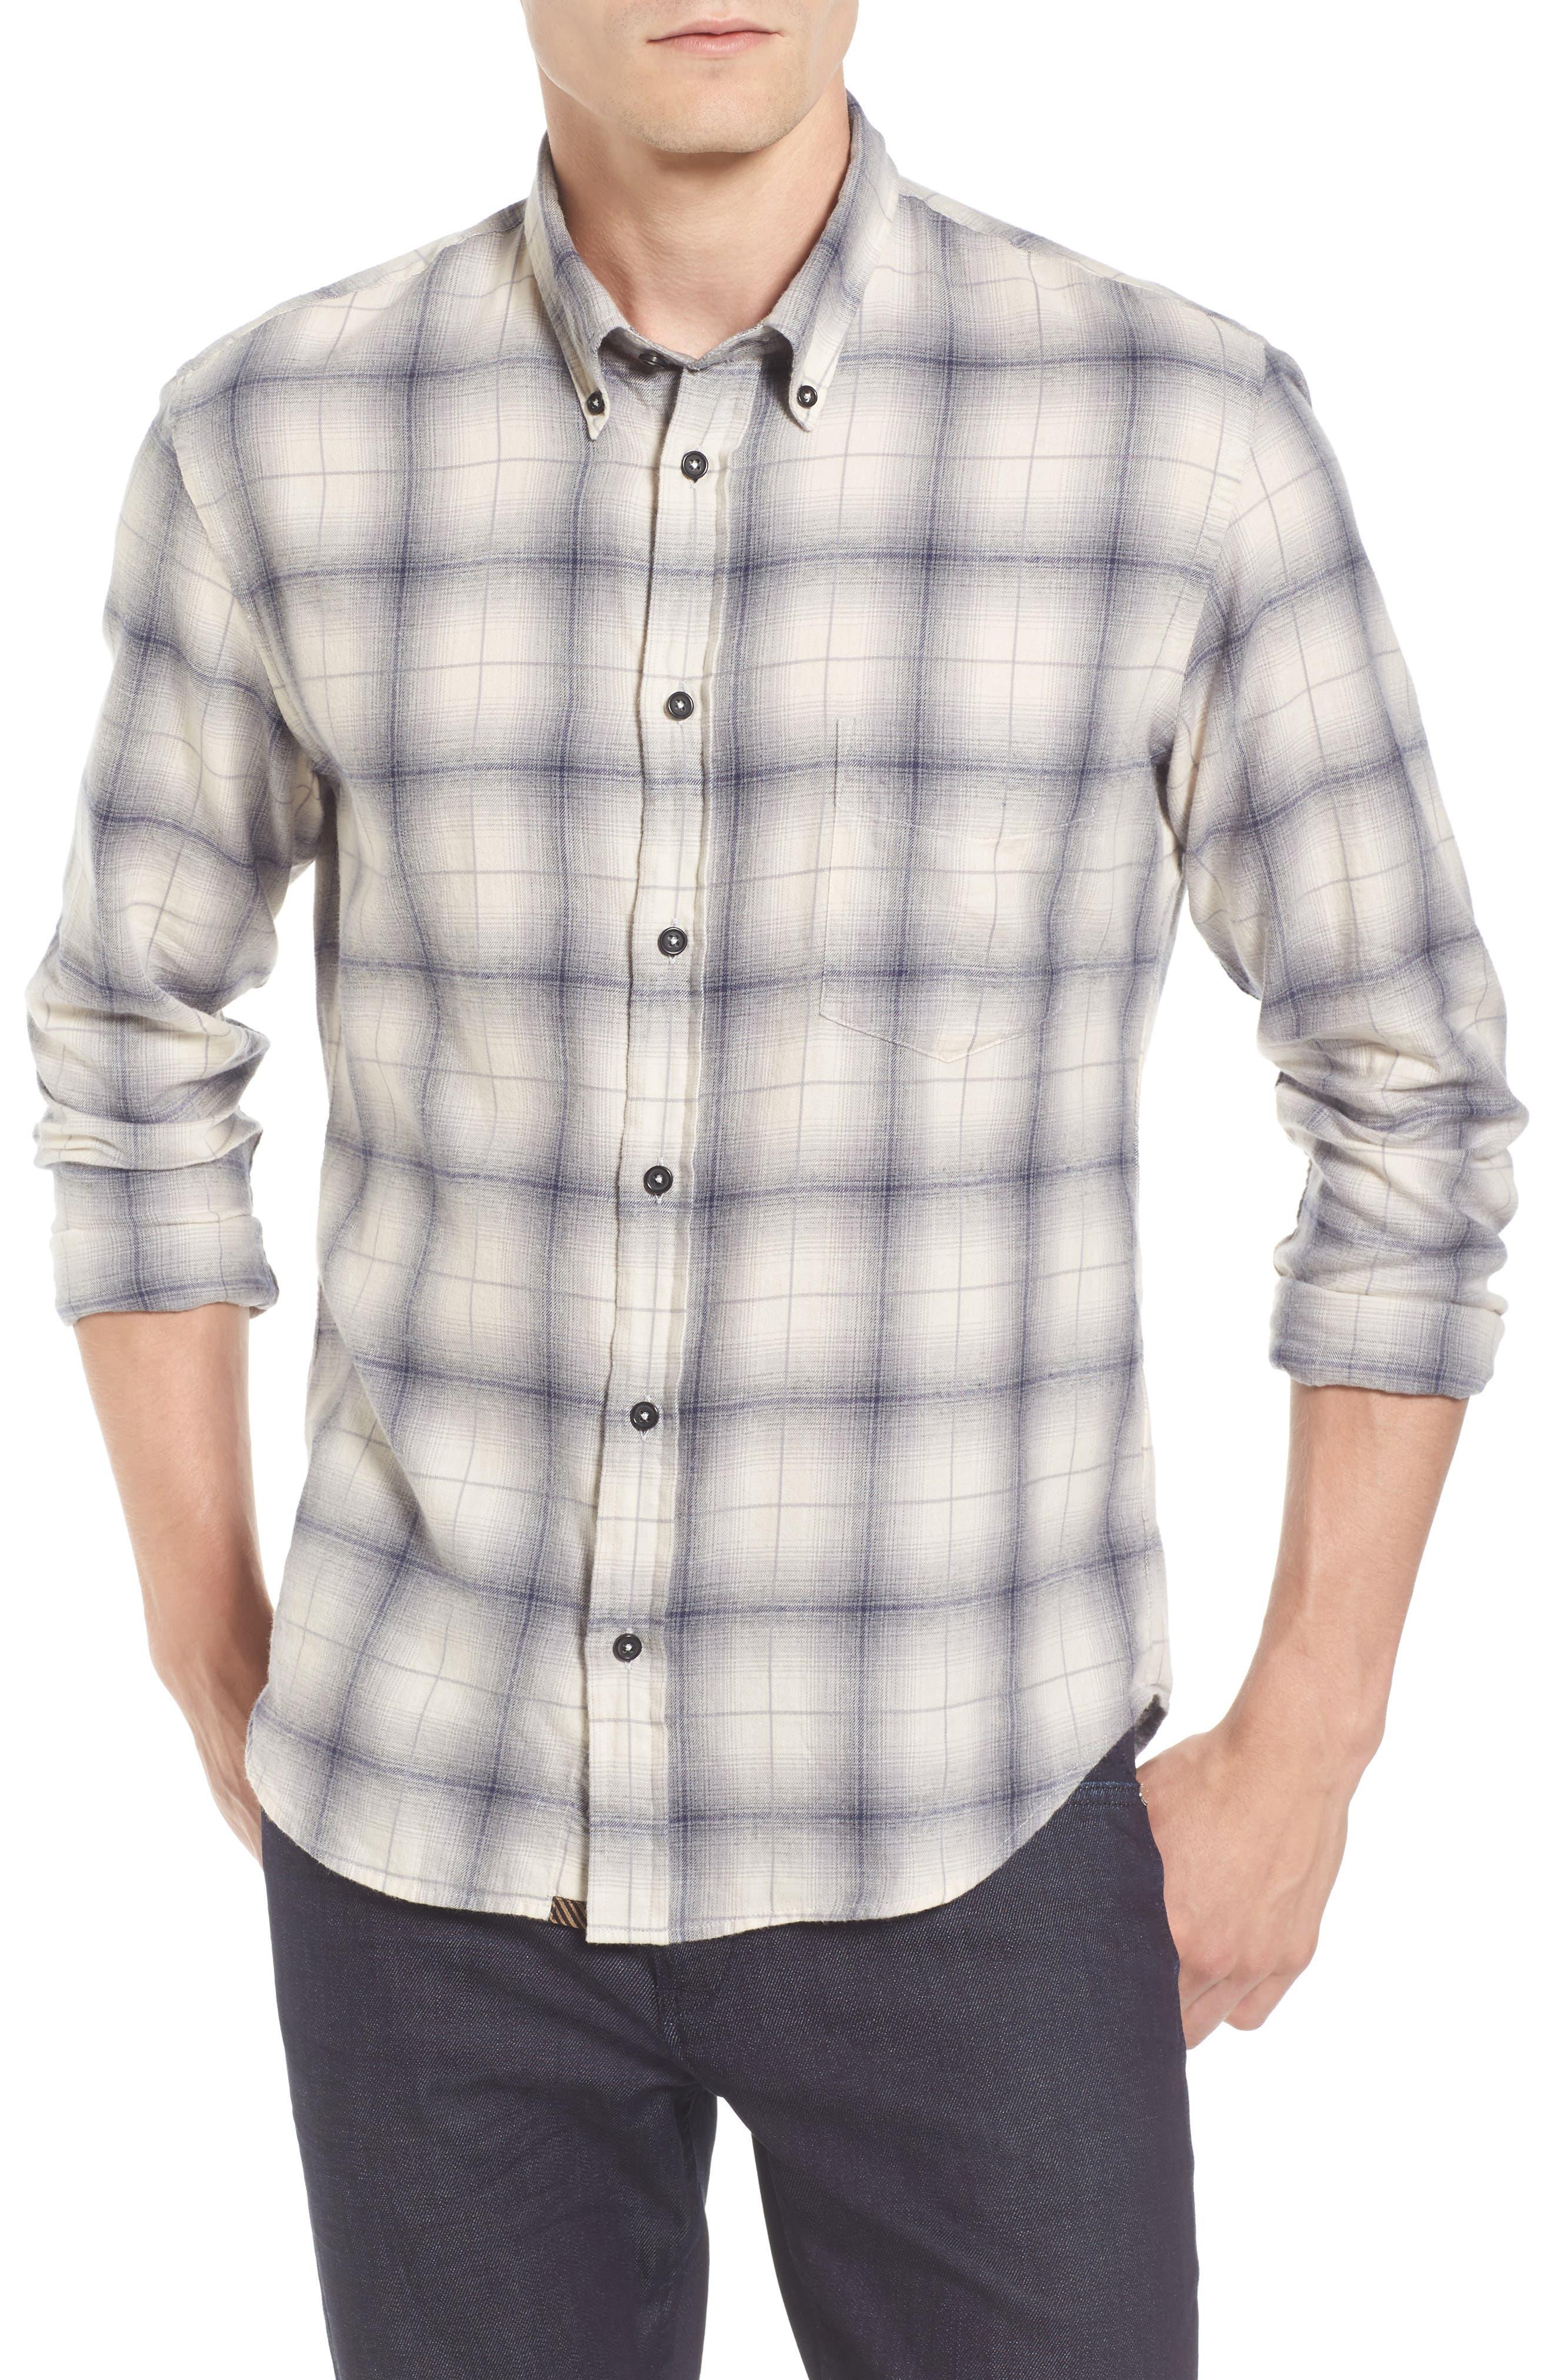 Kirby Slim Fit Plaid Flannel Shirt,                         Main,                         color, Grey/ Blue